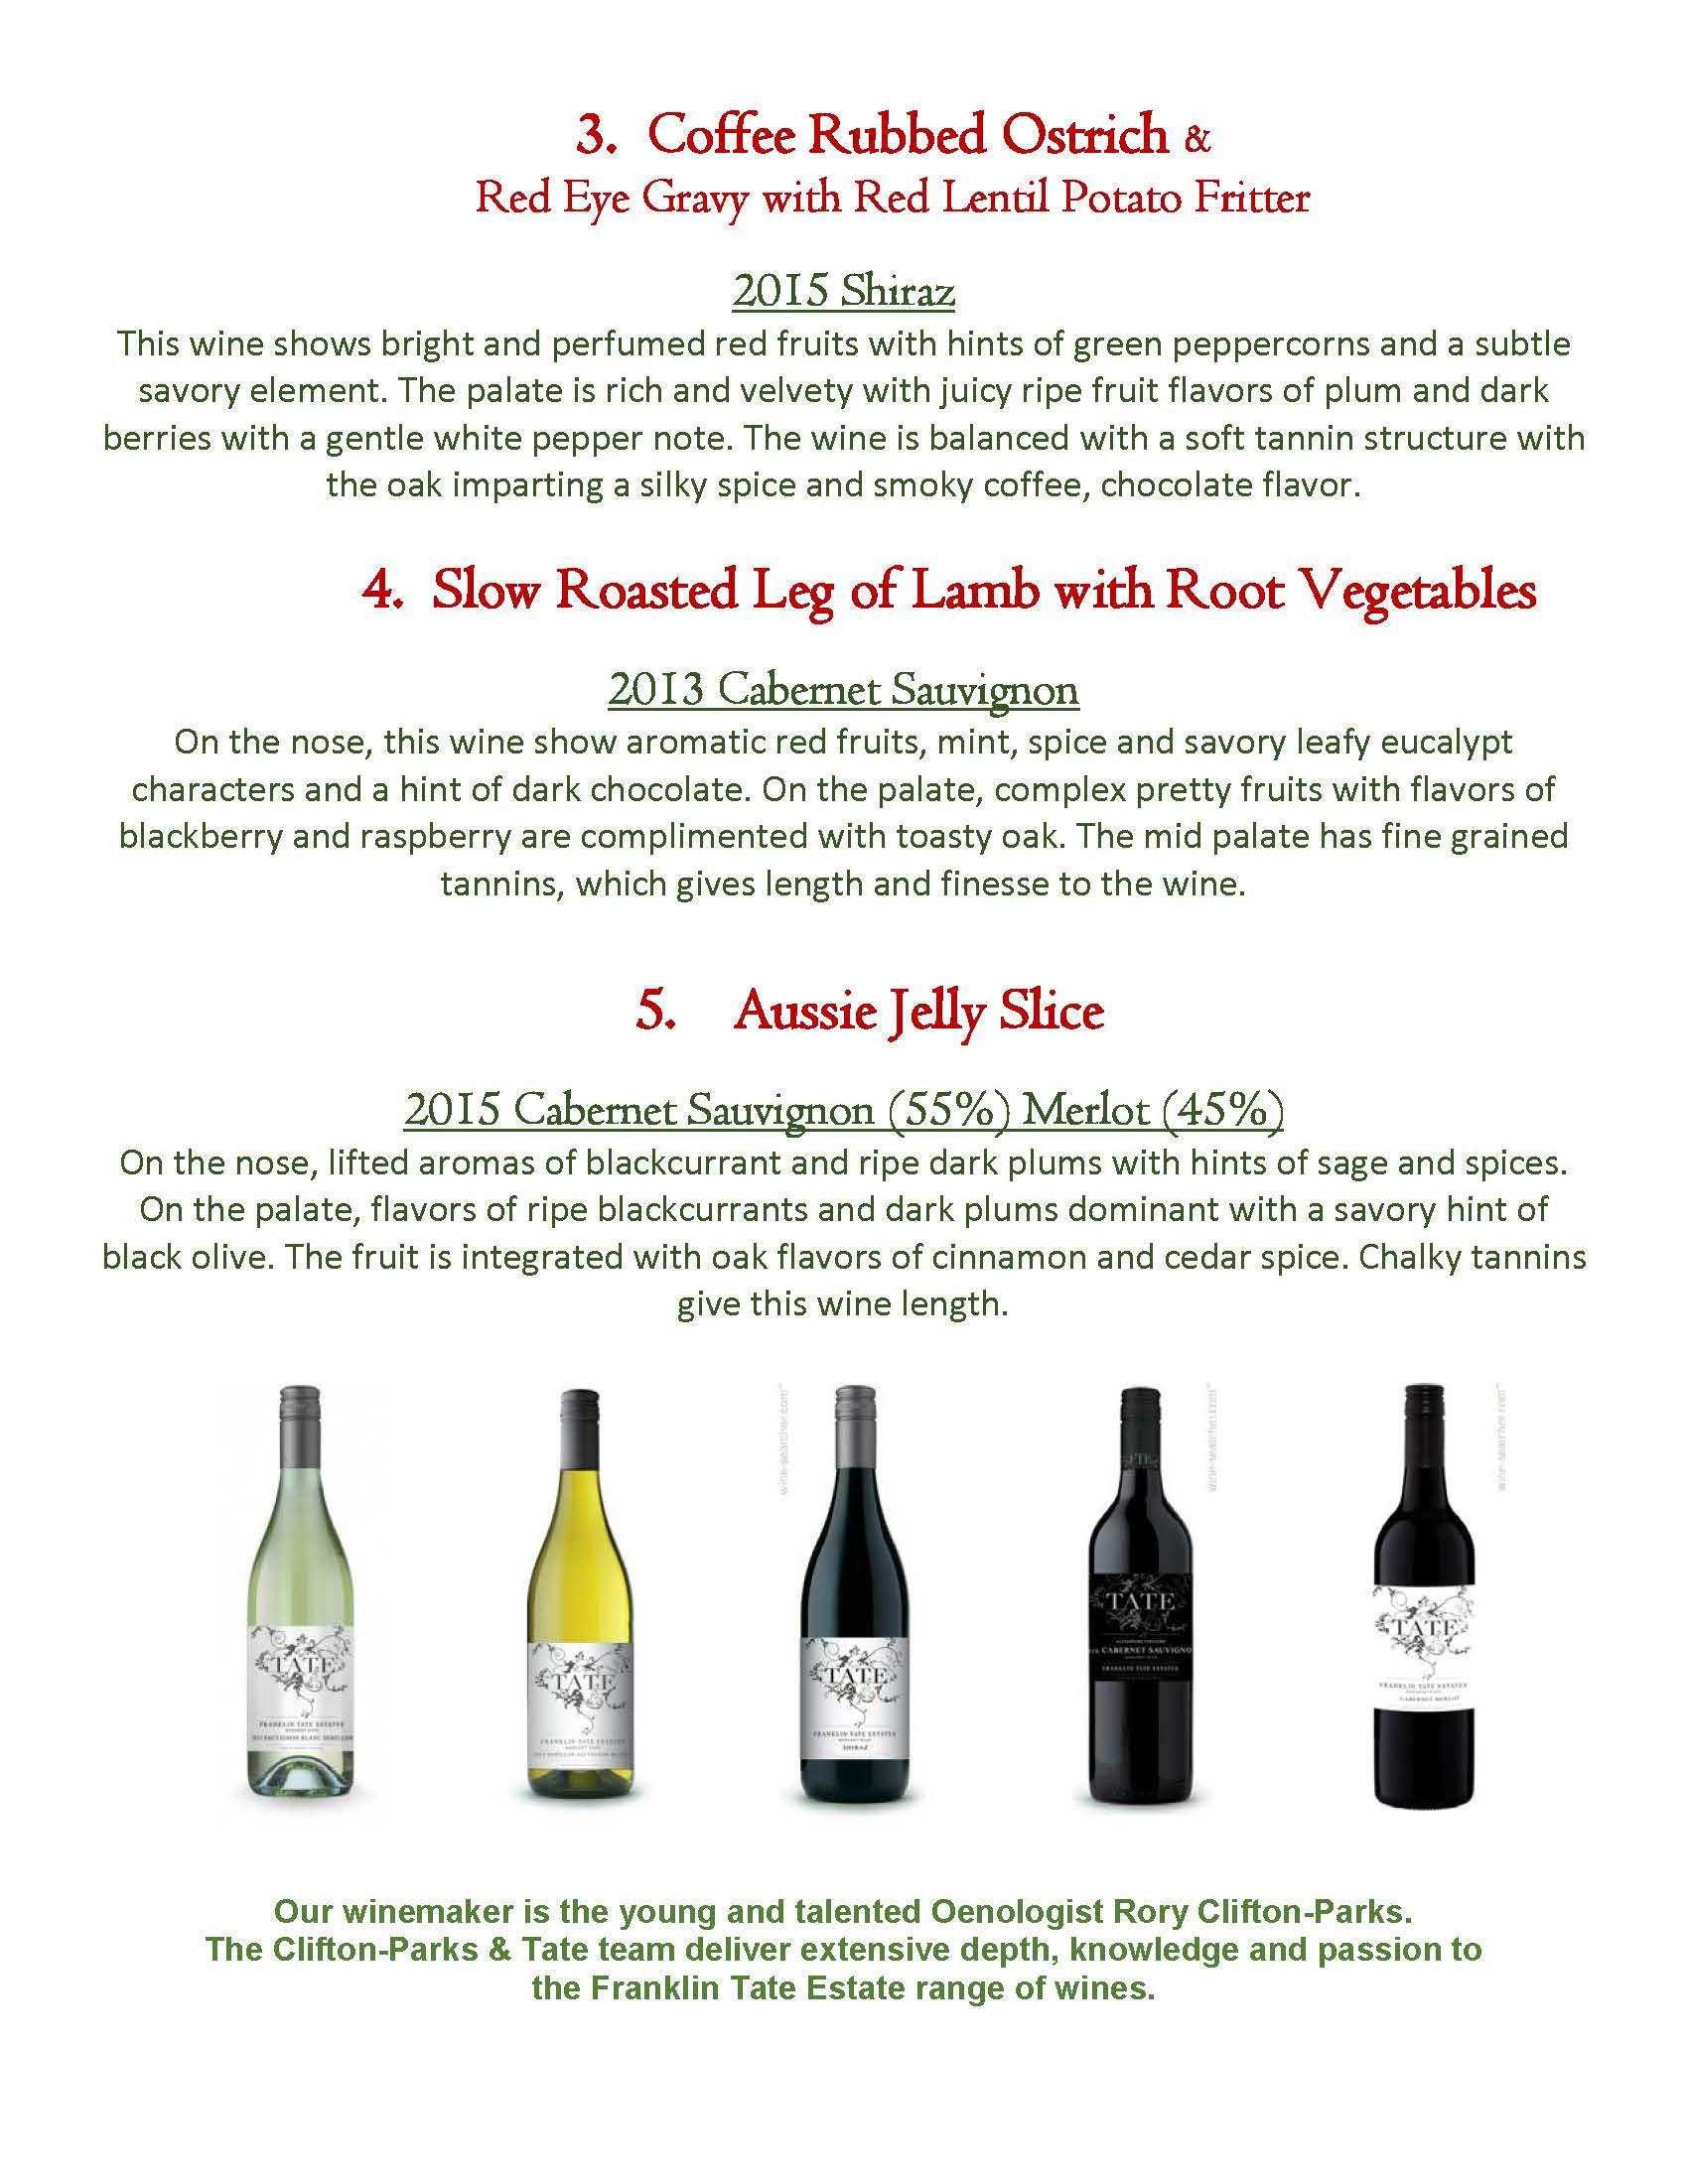 July 25th Wine Dinner Portrait_Page_2.jpg